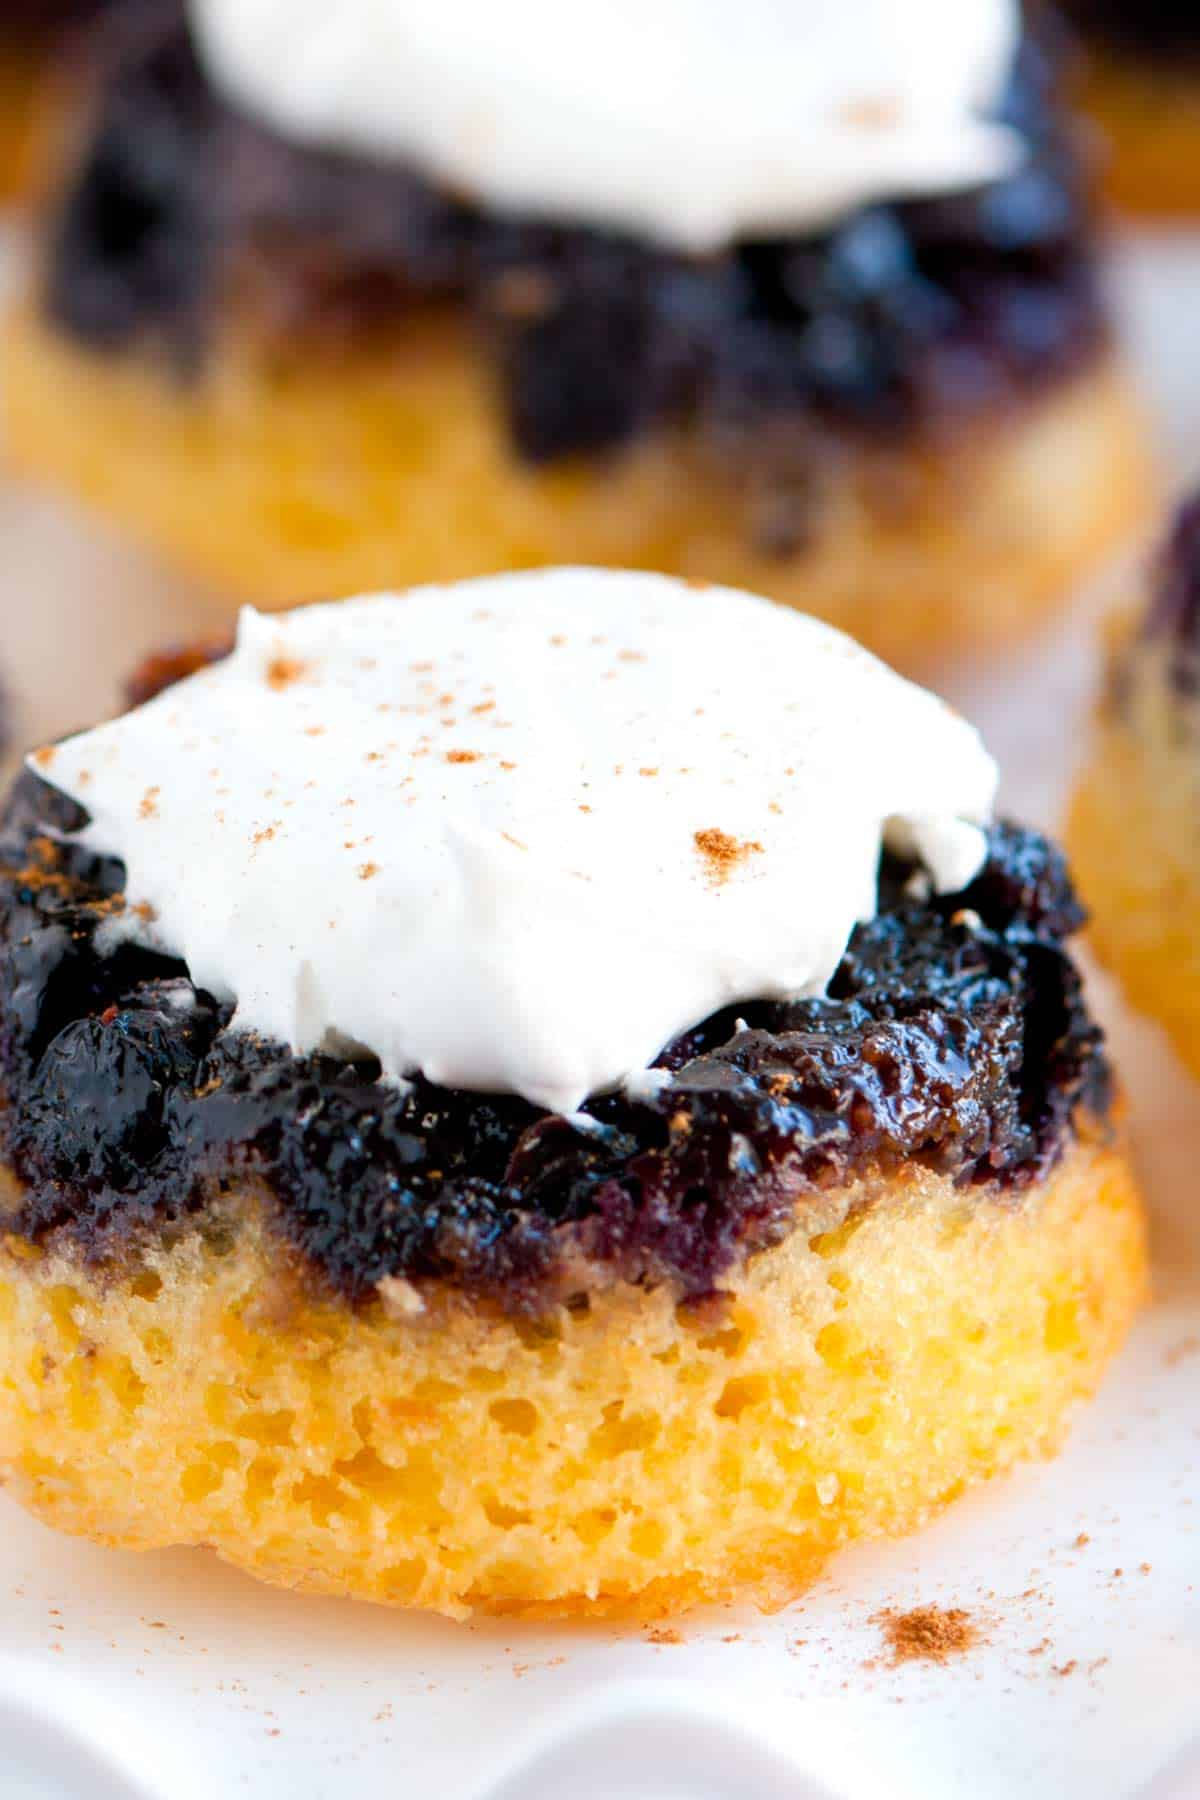 How to Make Mini Blueberry Cakes